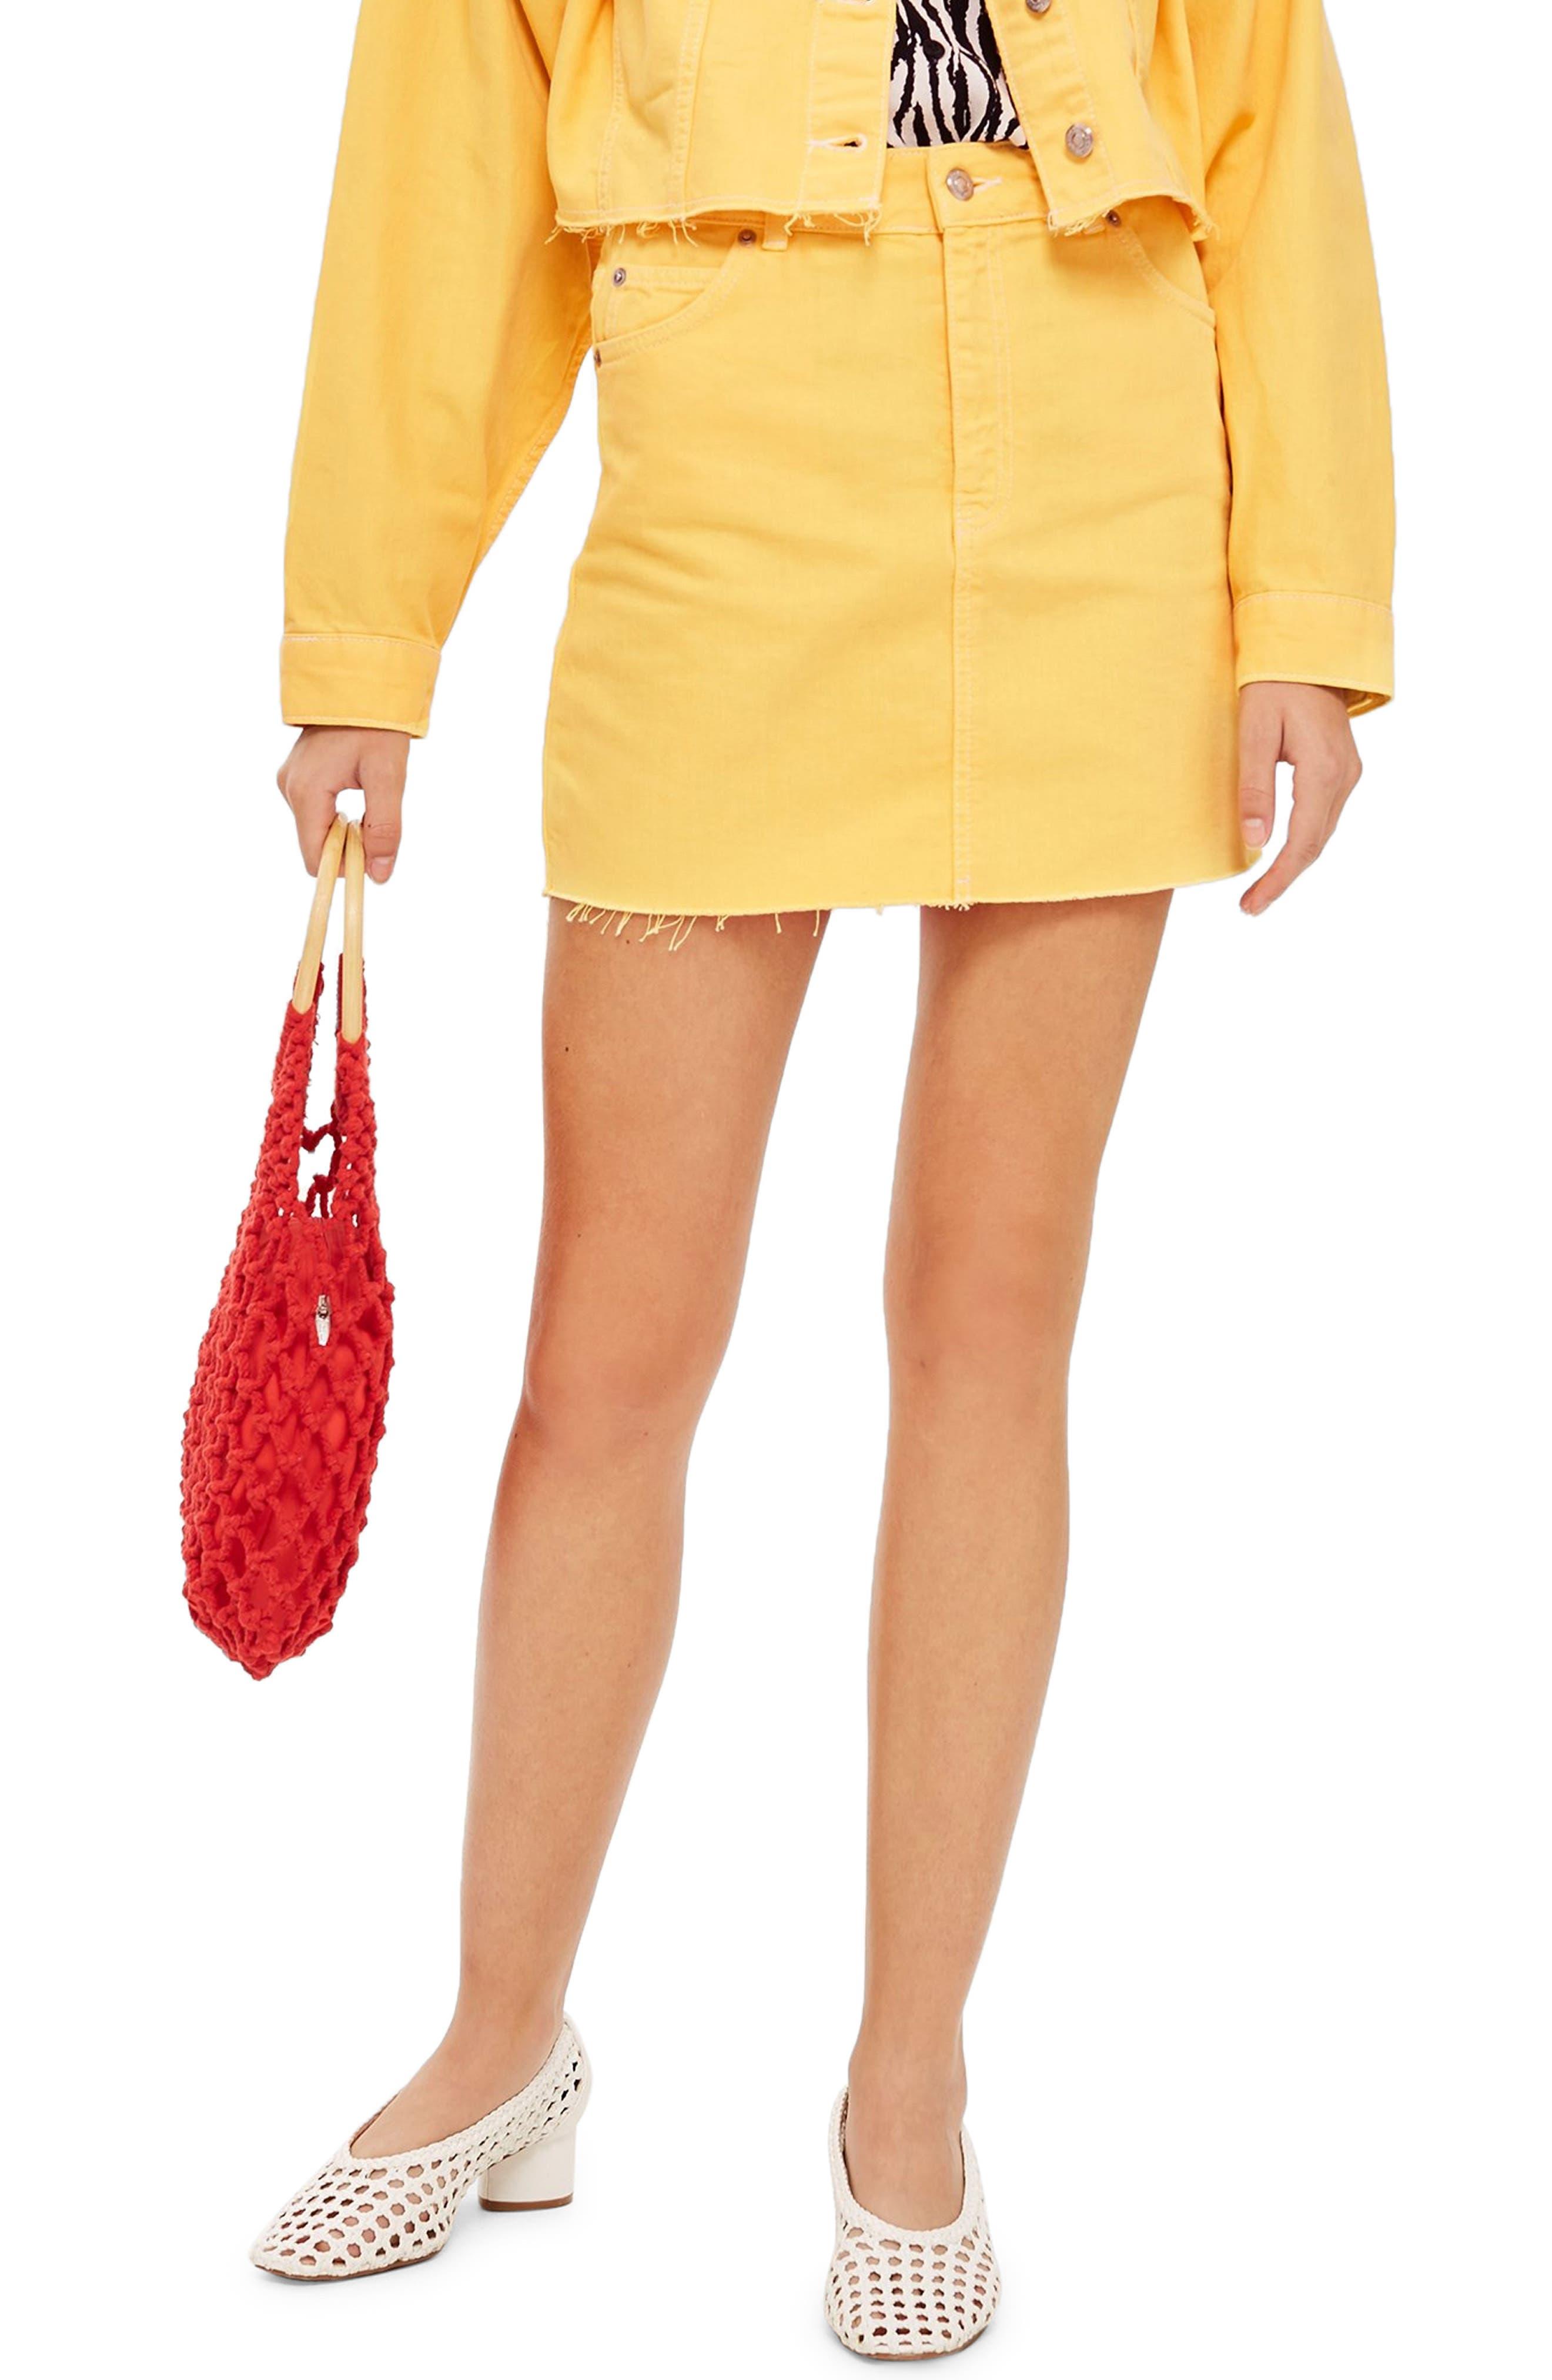 MOTO High Waist Denim Skirt,                             Main thumbnail 1, color,                             YELLOW